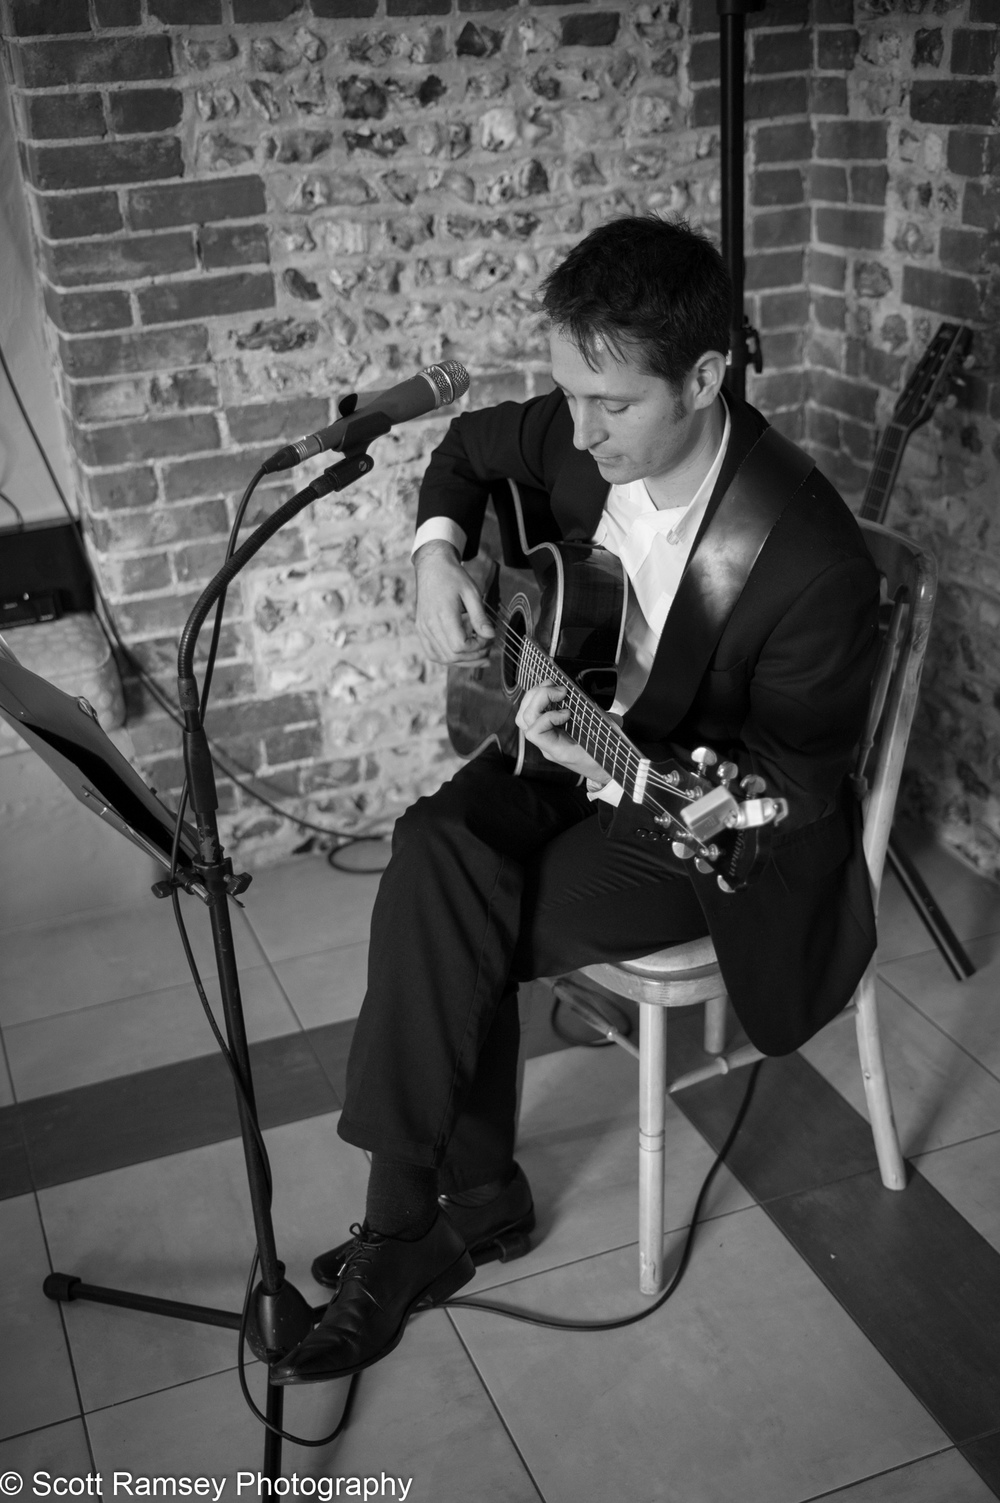 Wedding Upwaltham Barns Musician 15121207